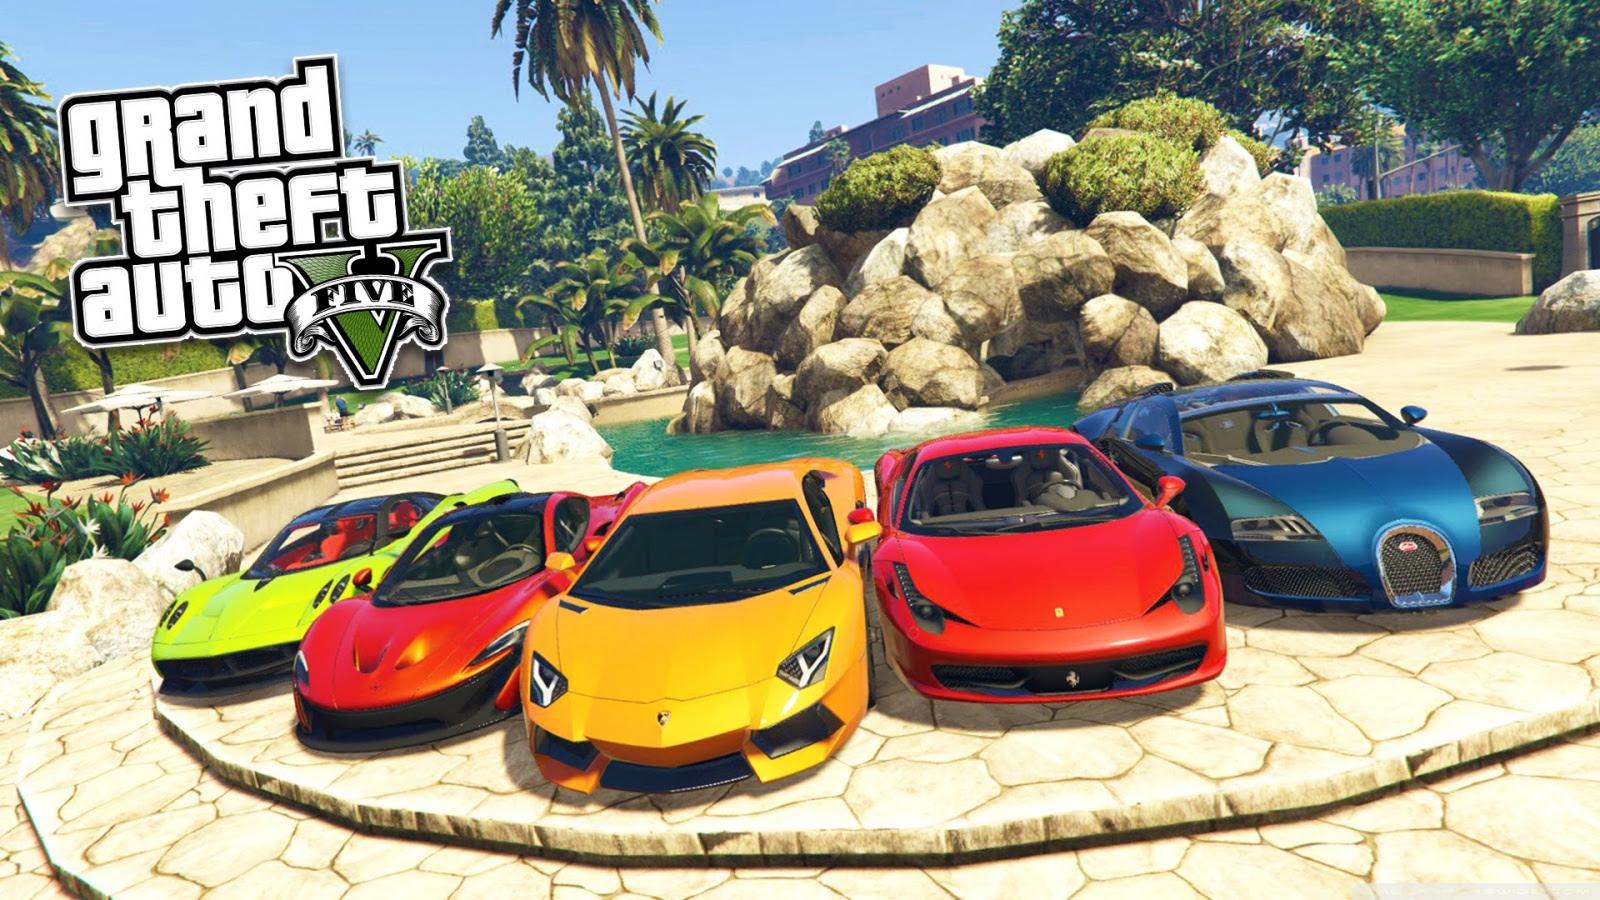 Grand Theft Auto V Cars Ultra Hd Desktop Background Wallpaper For